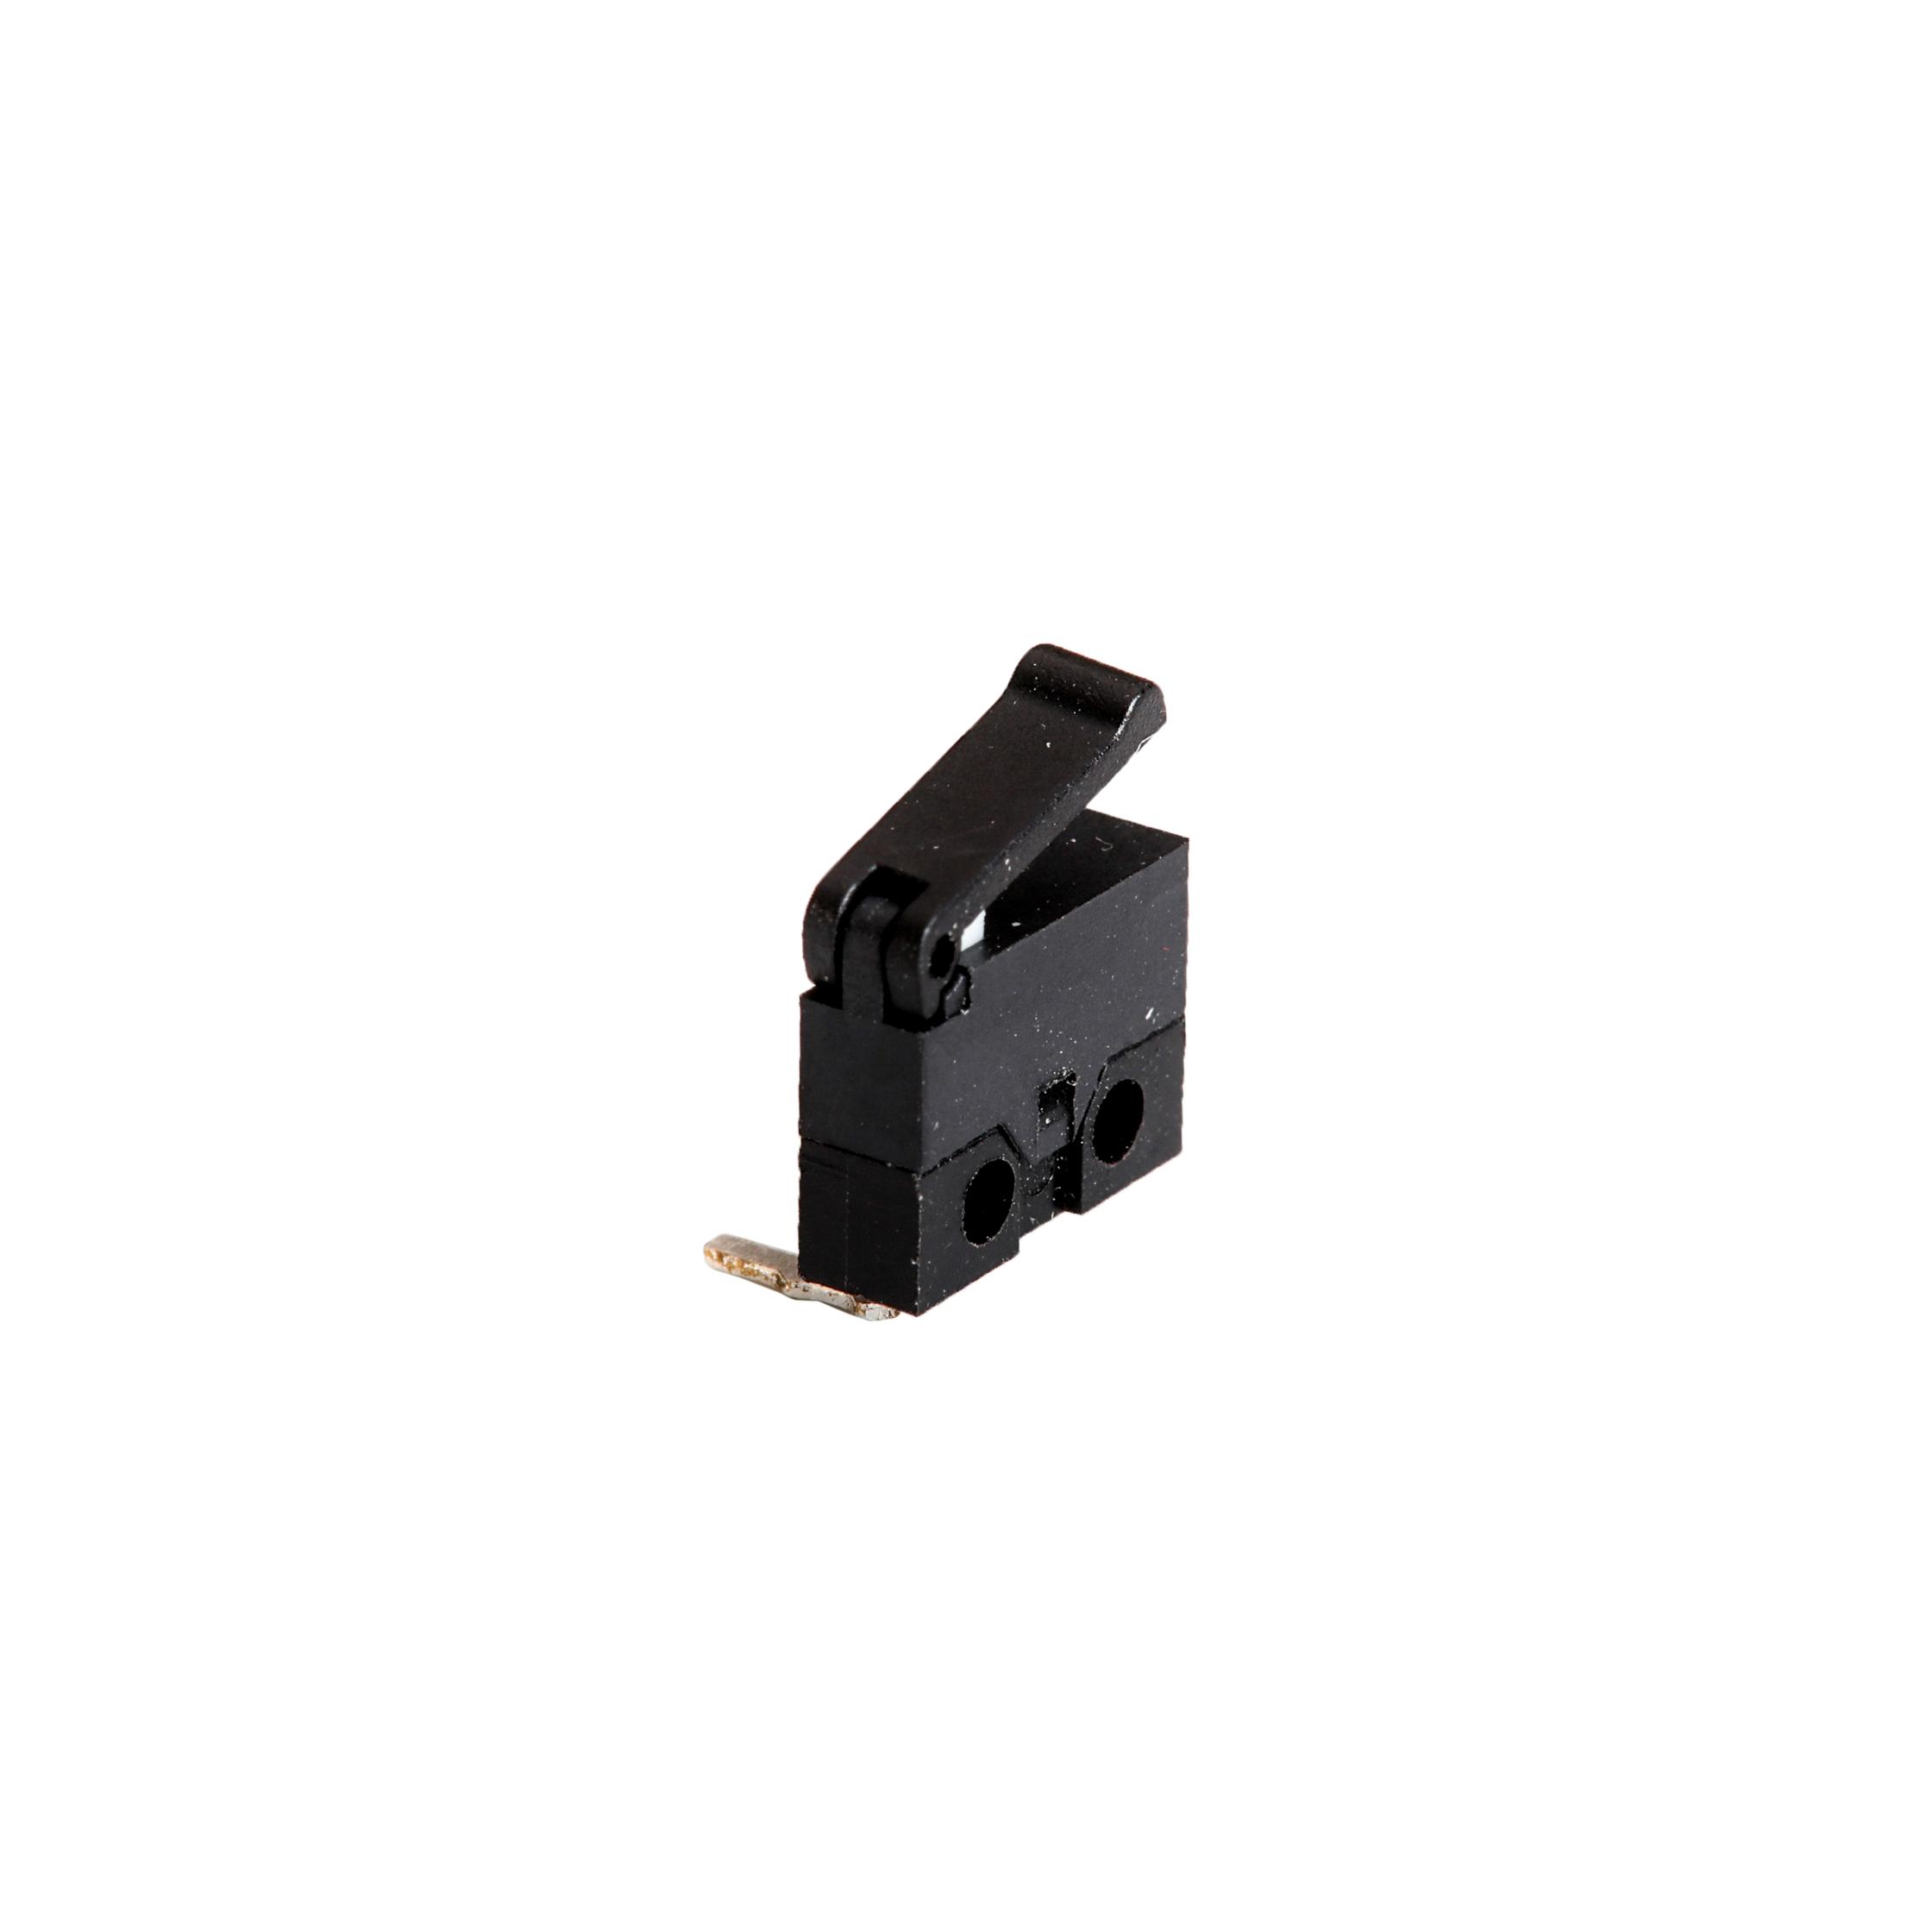 Detector switch KFC-W-13W-1 Featured Image